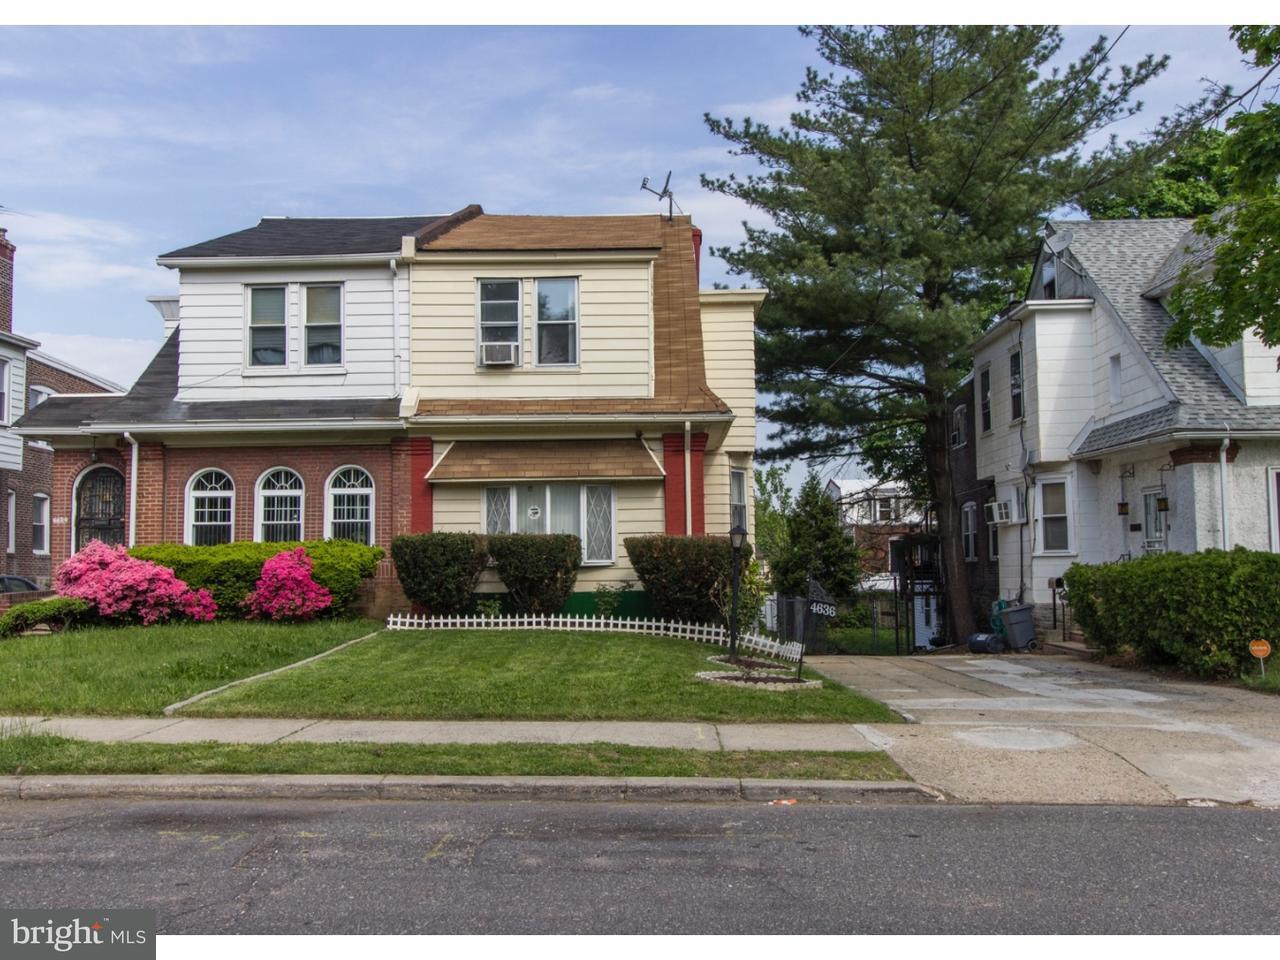 4636  Pilling Street Philadelphia , PA 19124